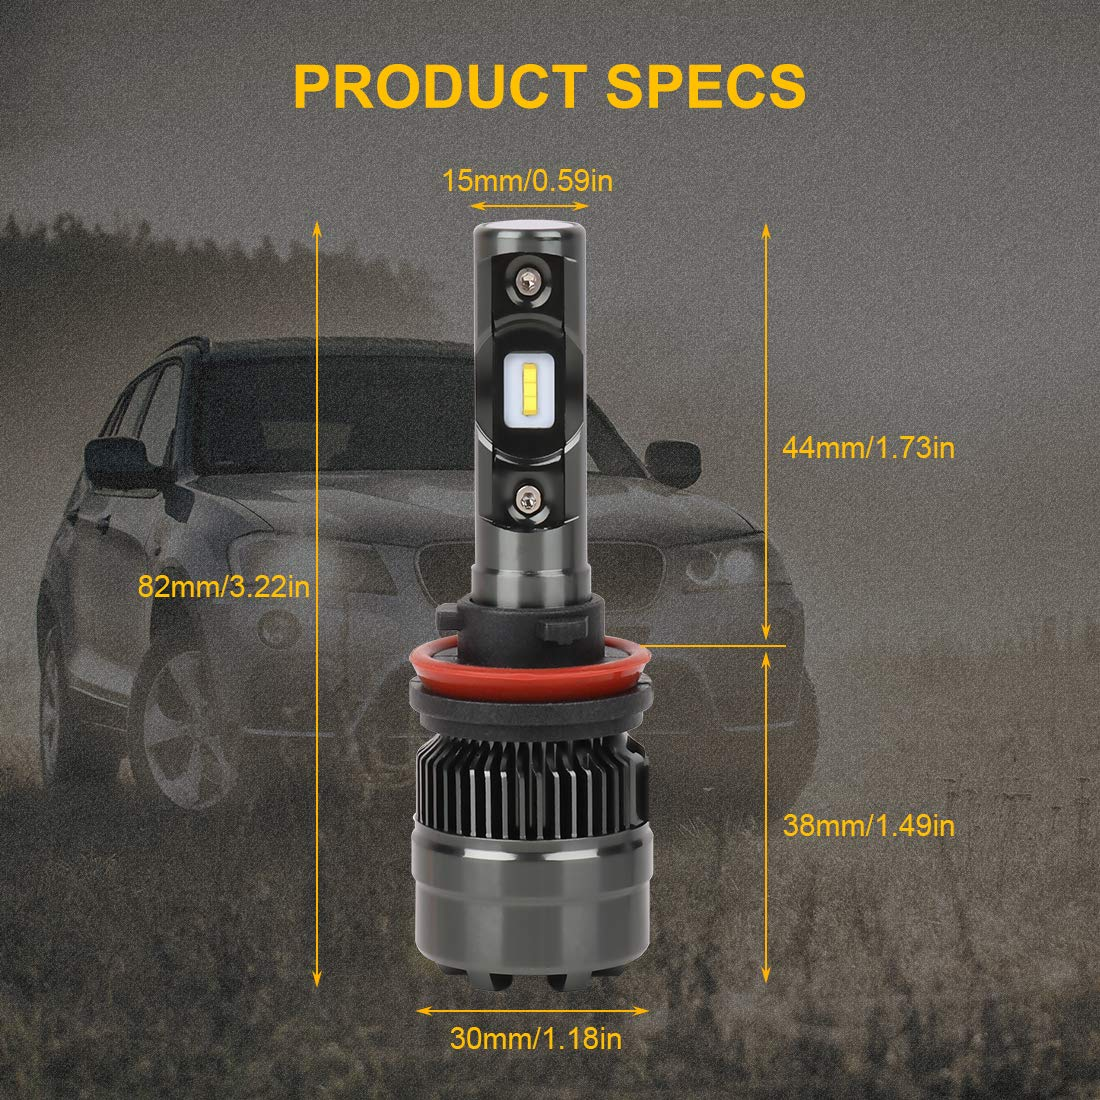 Adjustable Beam 24x CSP Chips 10000Lm 6500K 80W Cool White 2 Yr Warranty Drisharp H4//9003//HB2 LED Headlight Bulbs Hi//Lo Beam Conversion Kit DOT Approved